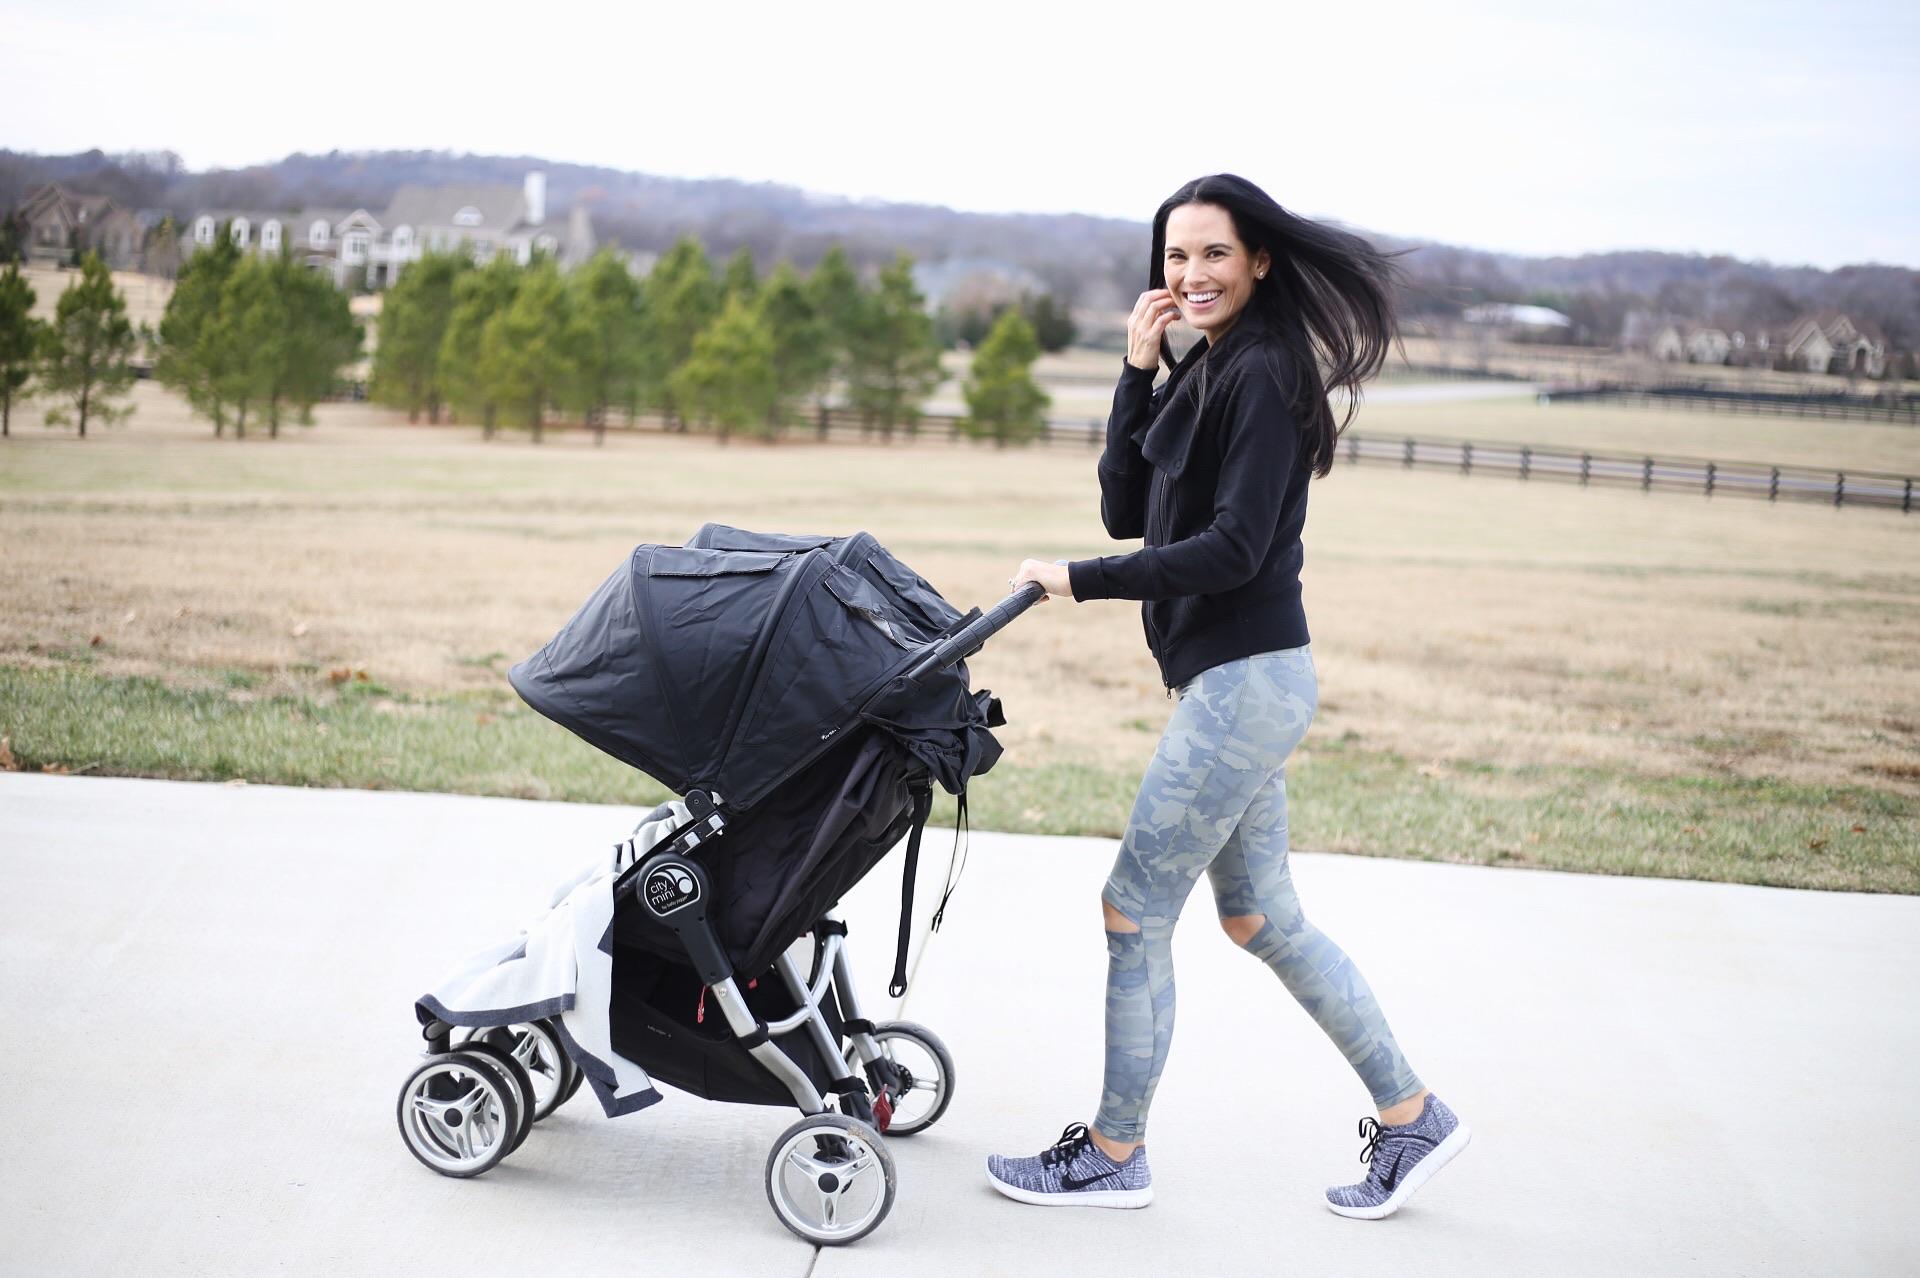 City Mini  Stroller  | Nike  sneakers |  leggings  | Jumper  similar  | photo: Sydney Clawson